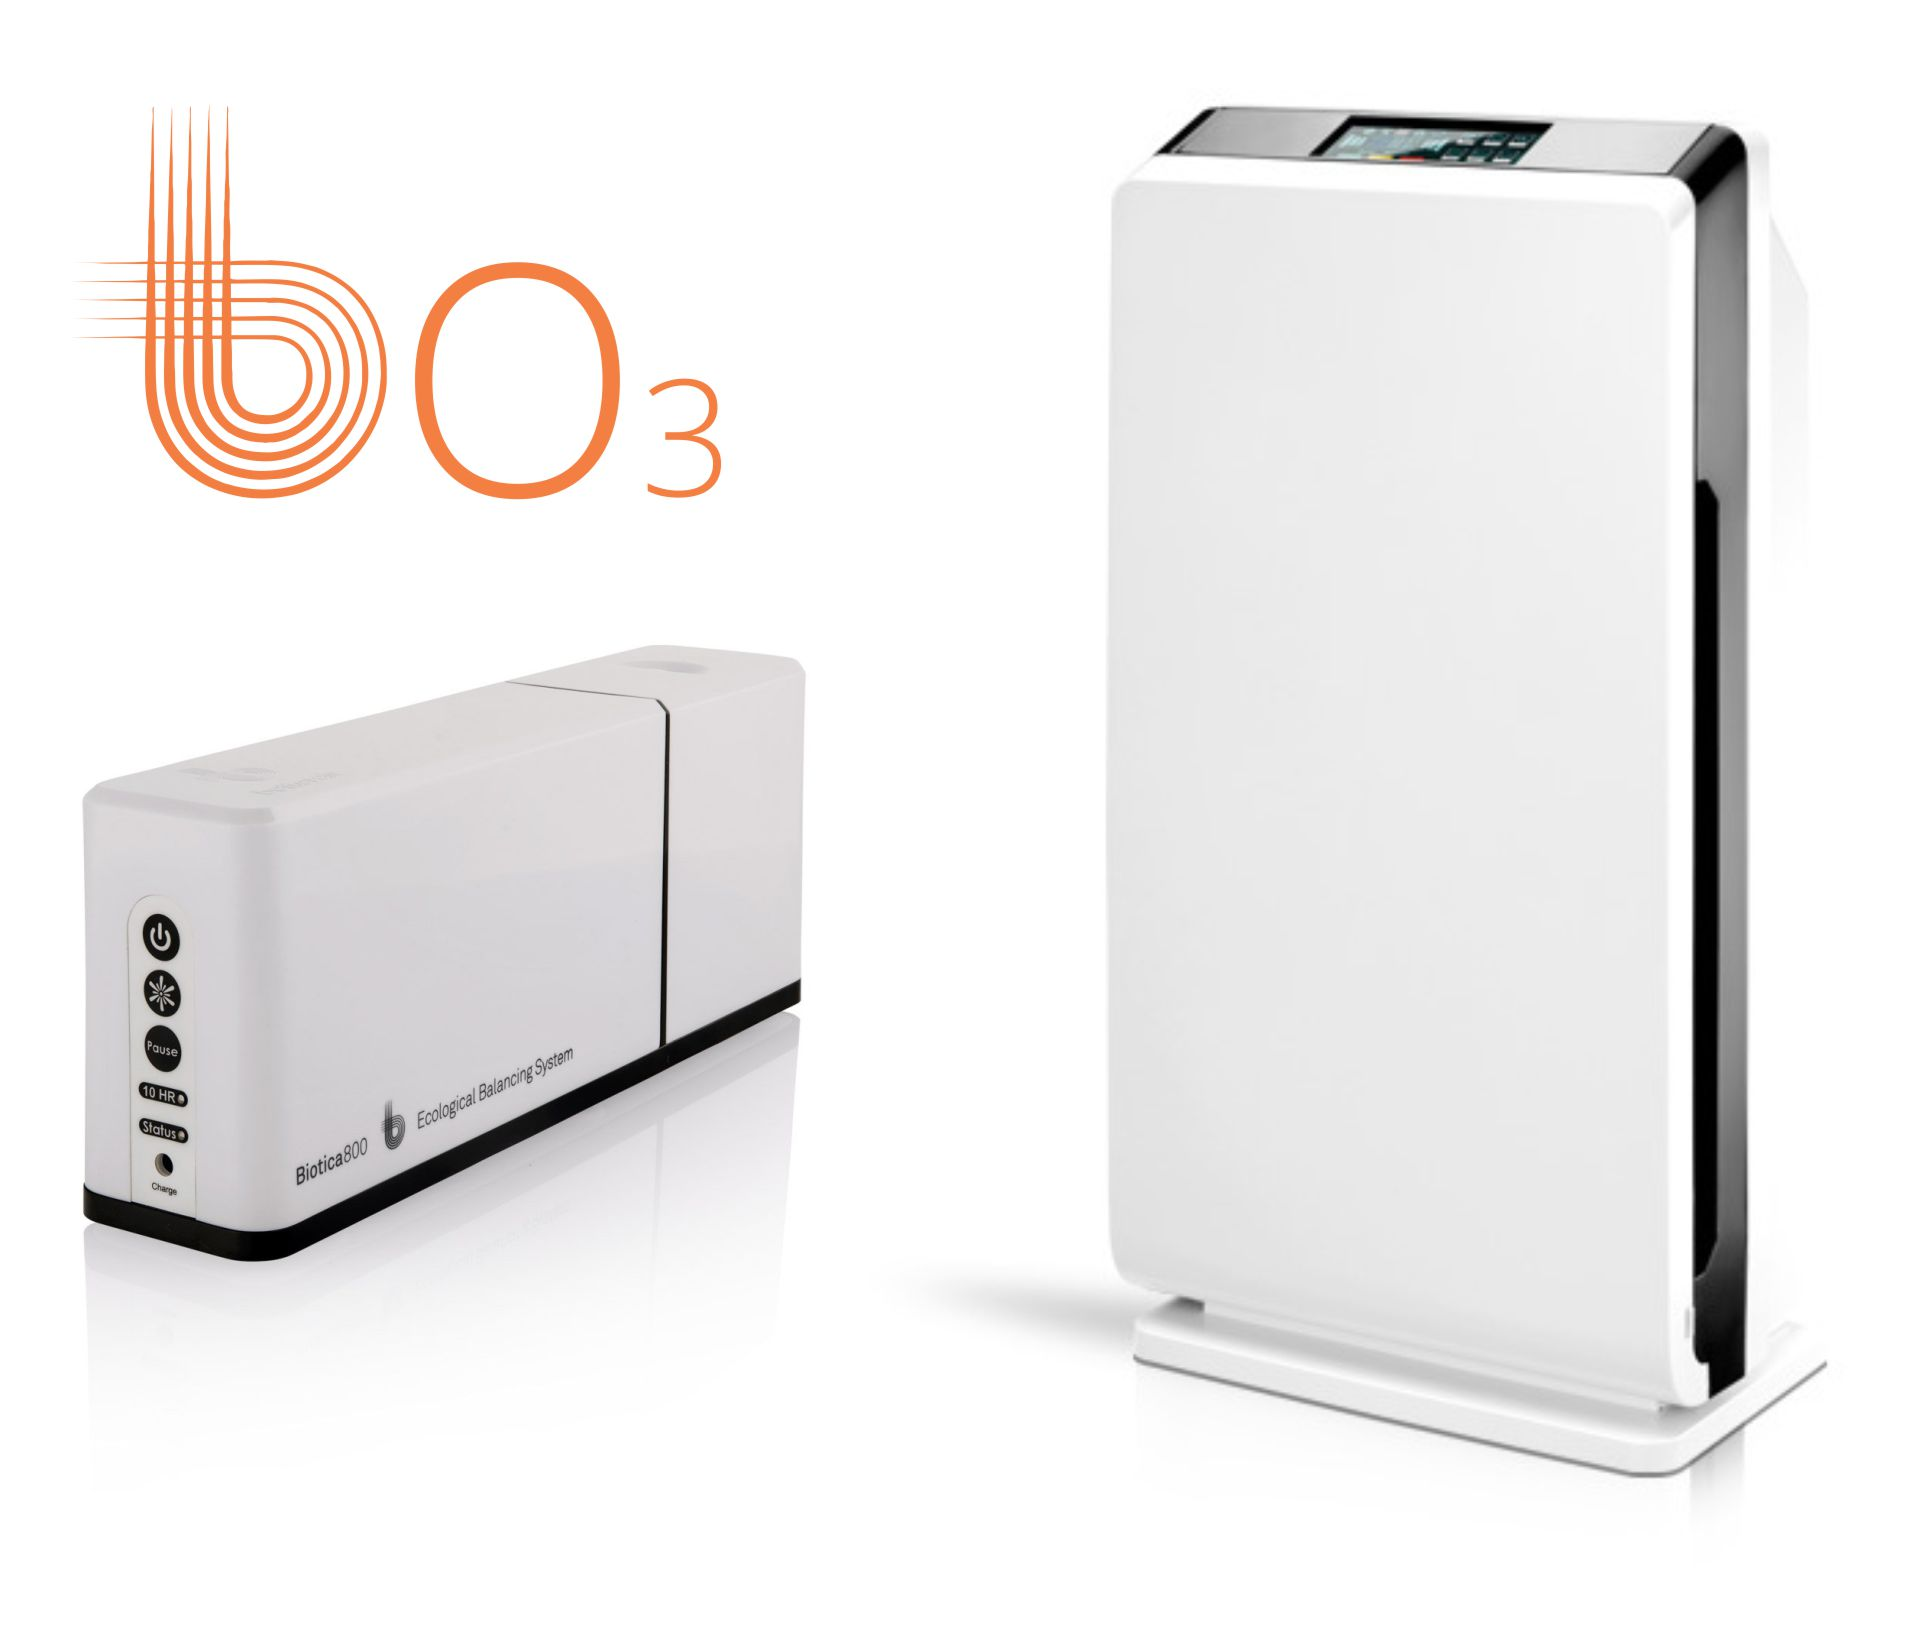 bo3-covid-19